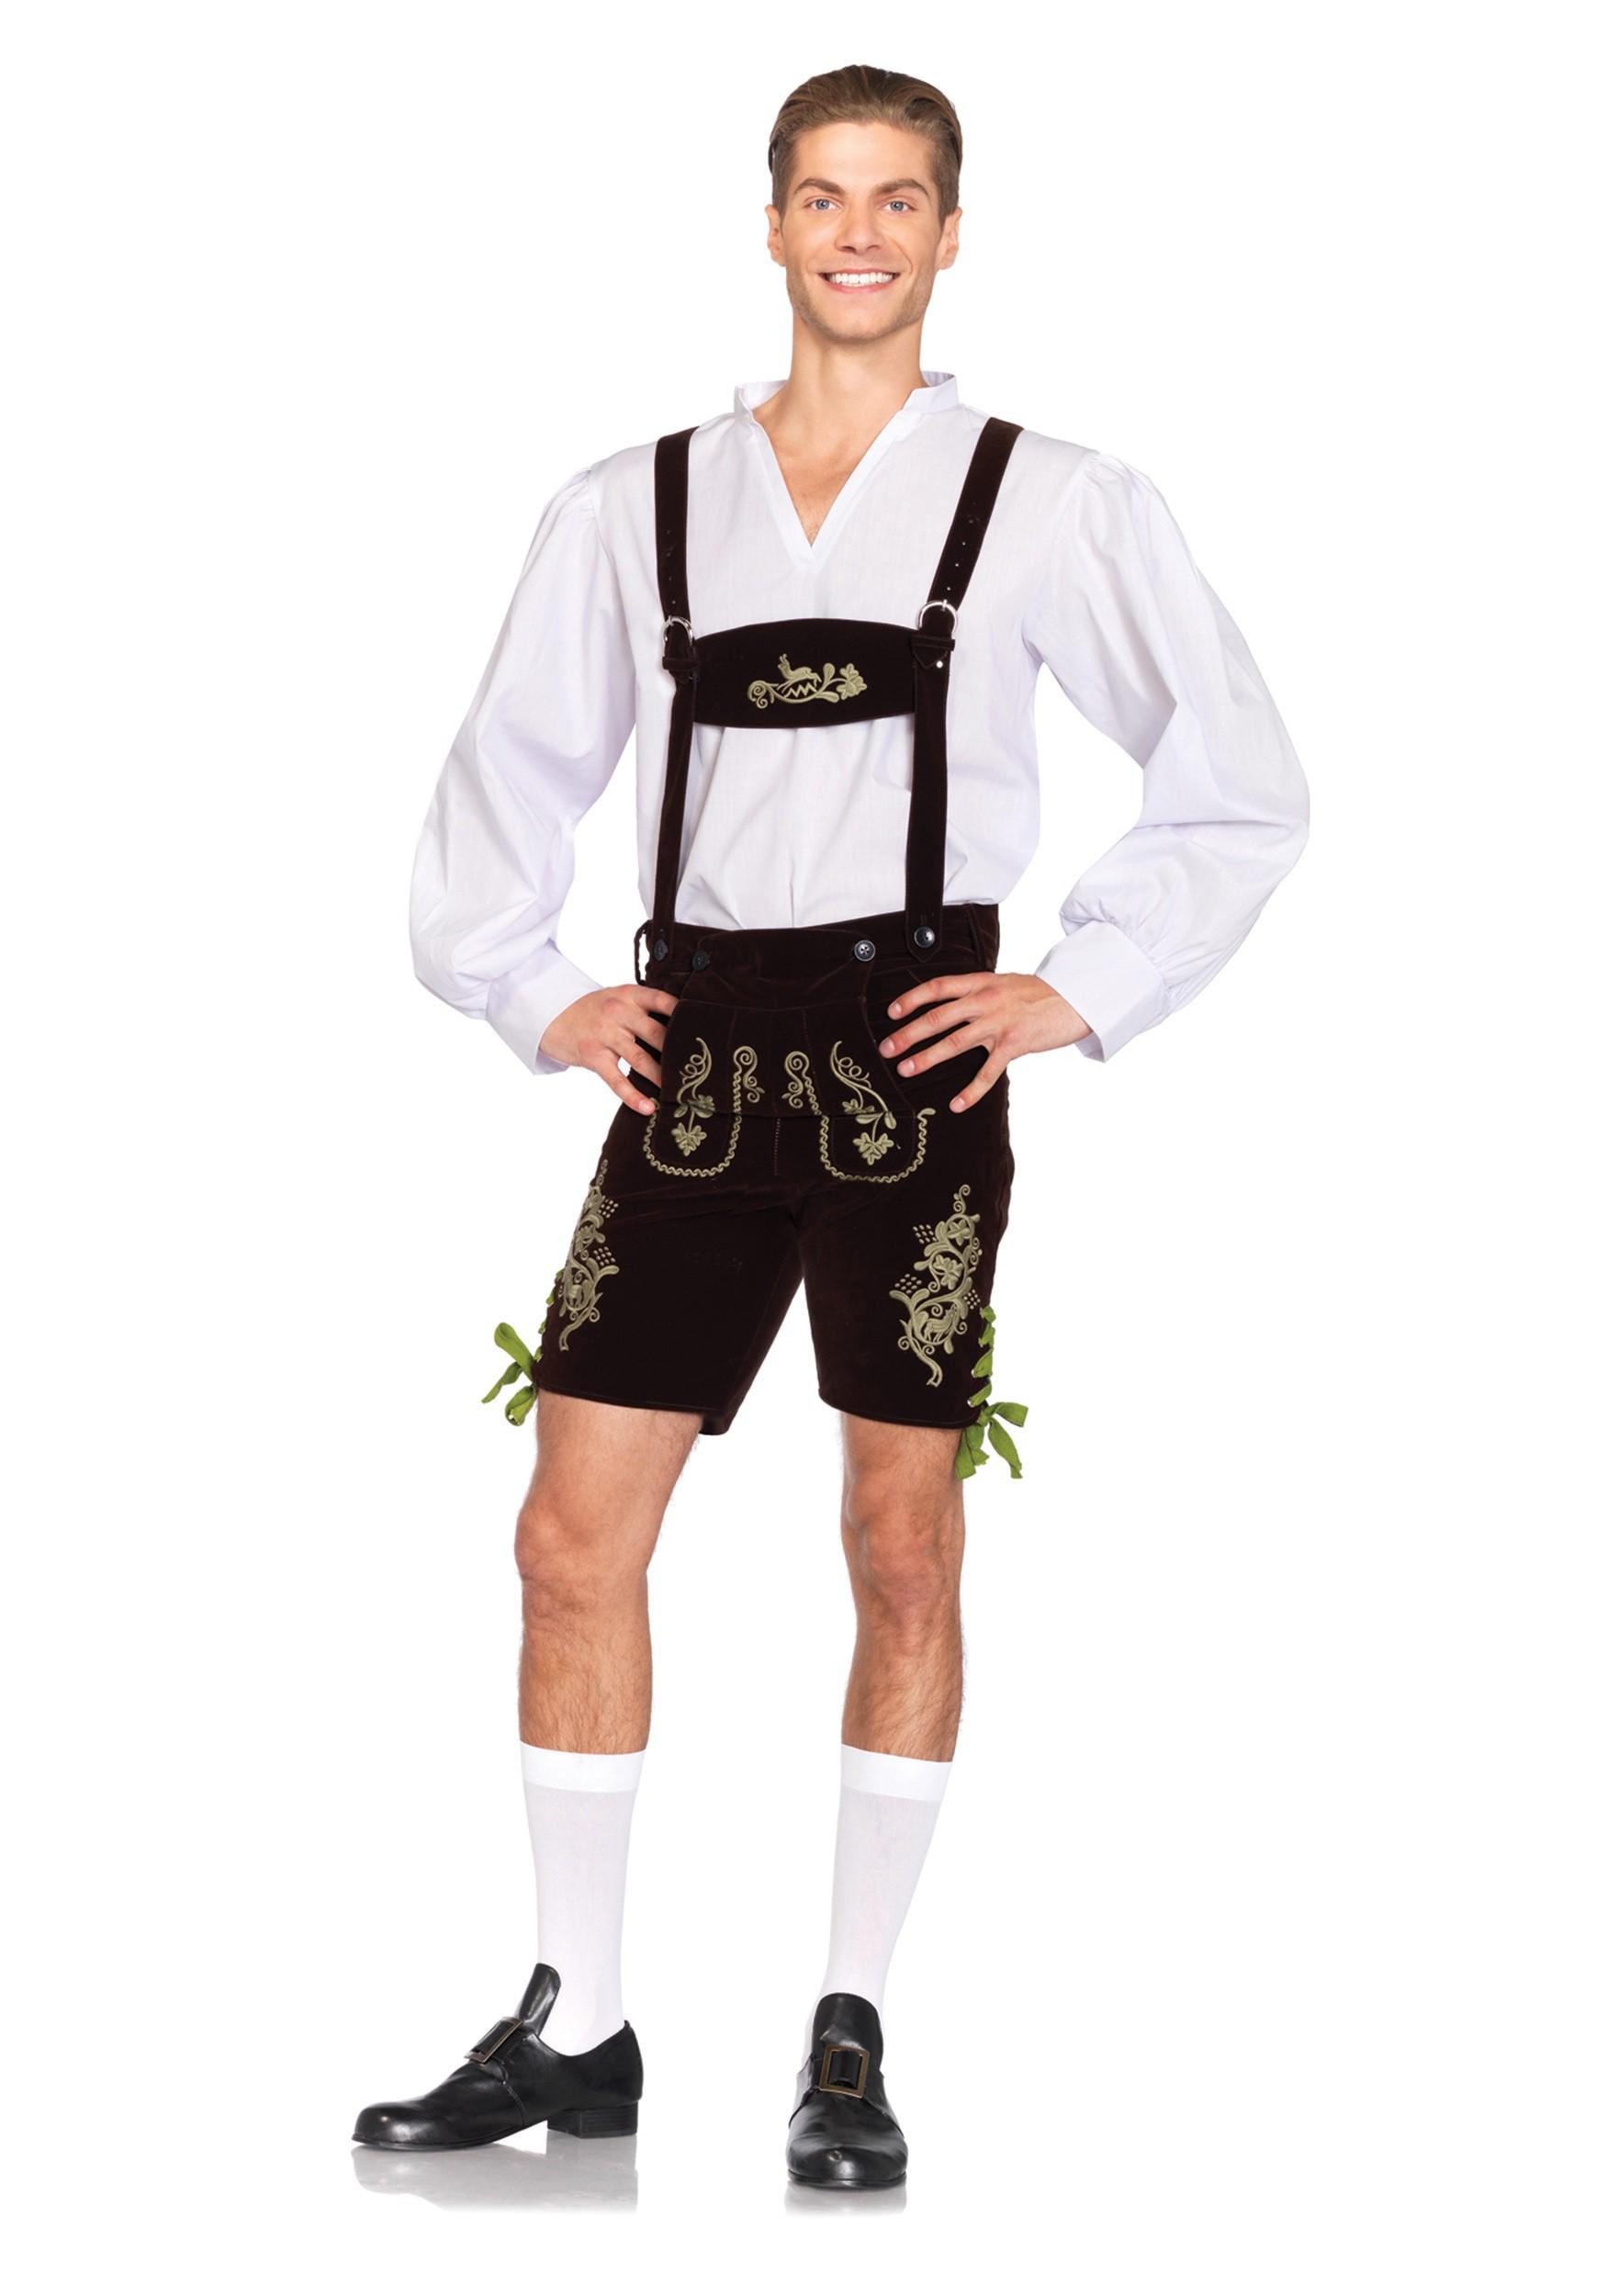 Costume Oktoberfest Lederhosen